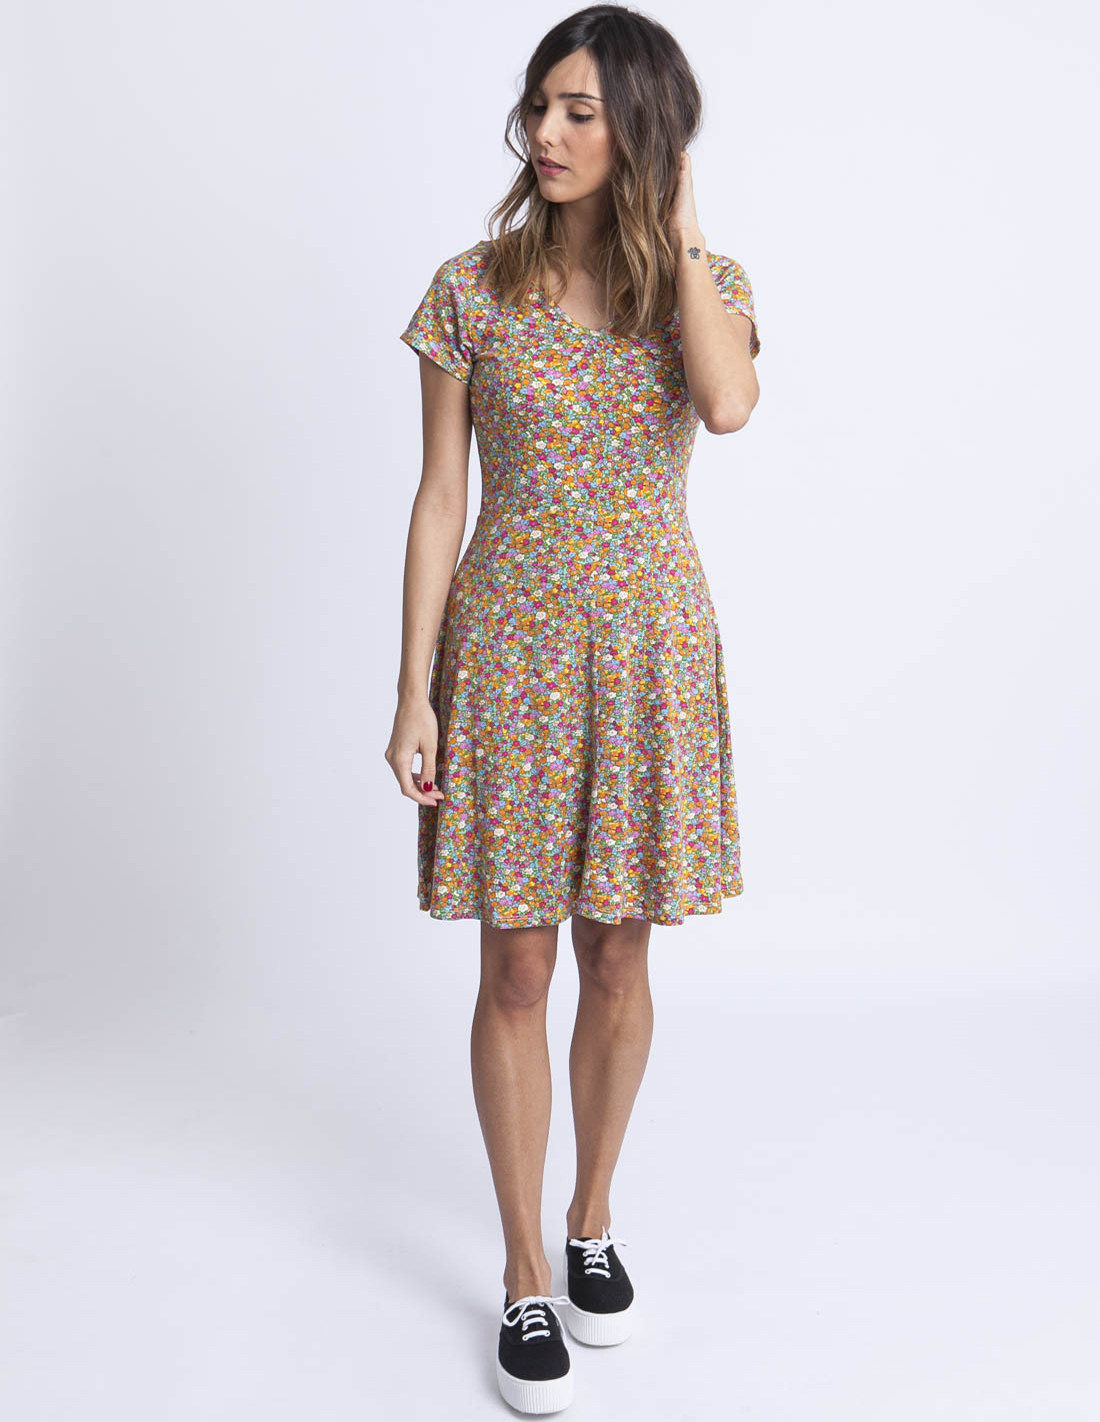 Comprar Vestido Flores Liberty Compañía Fantástica En Sommes Demode